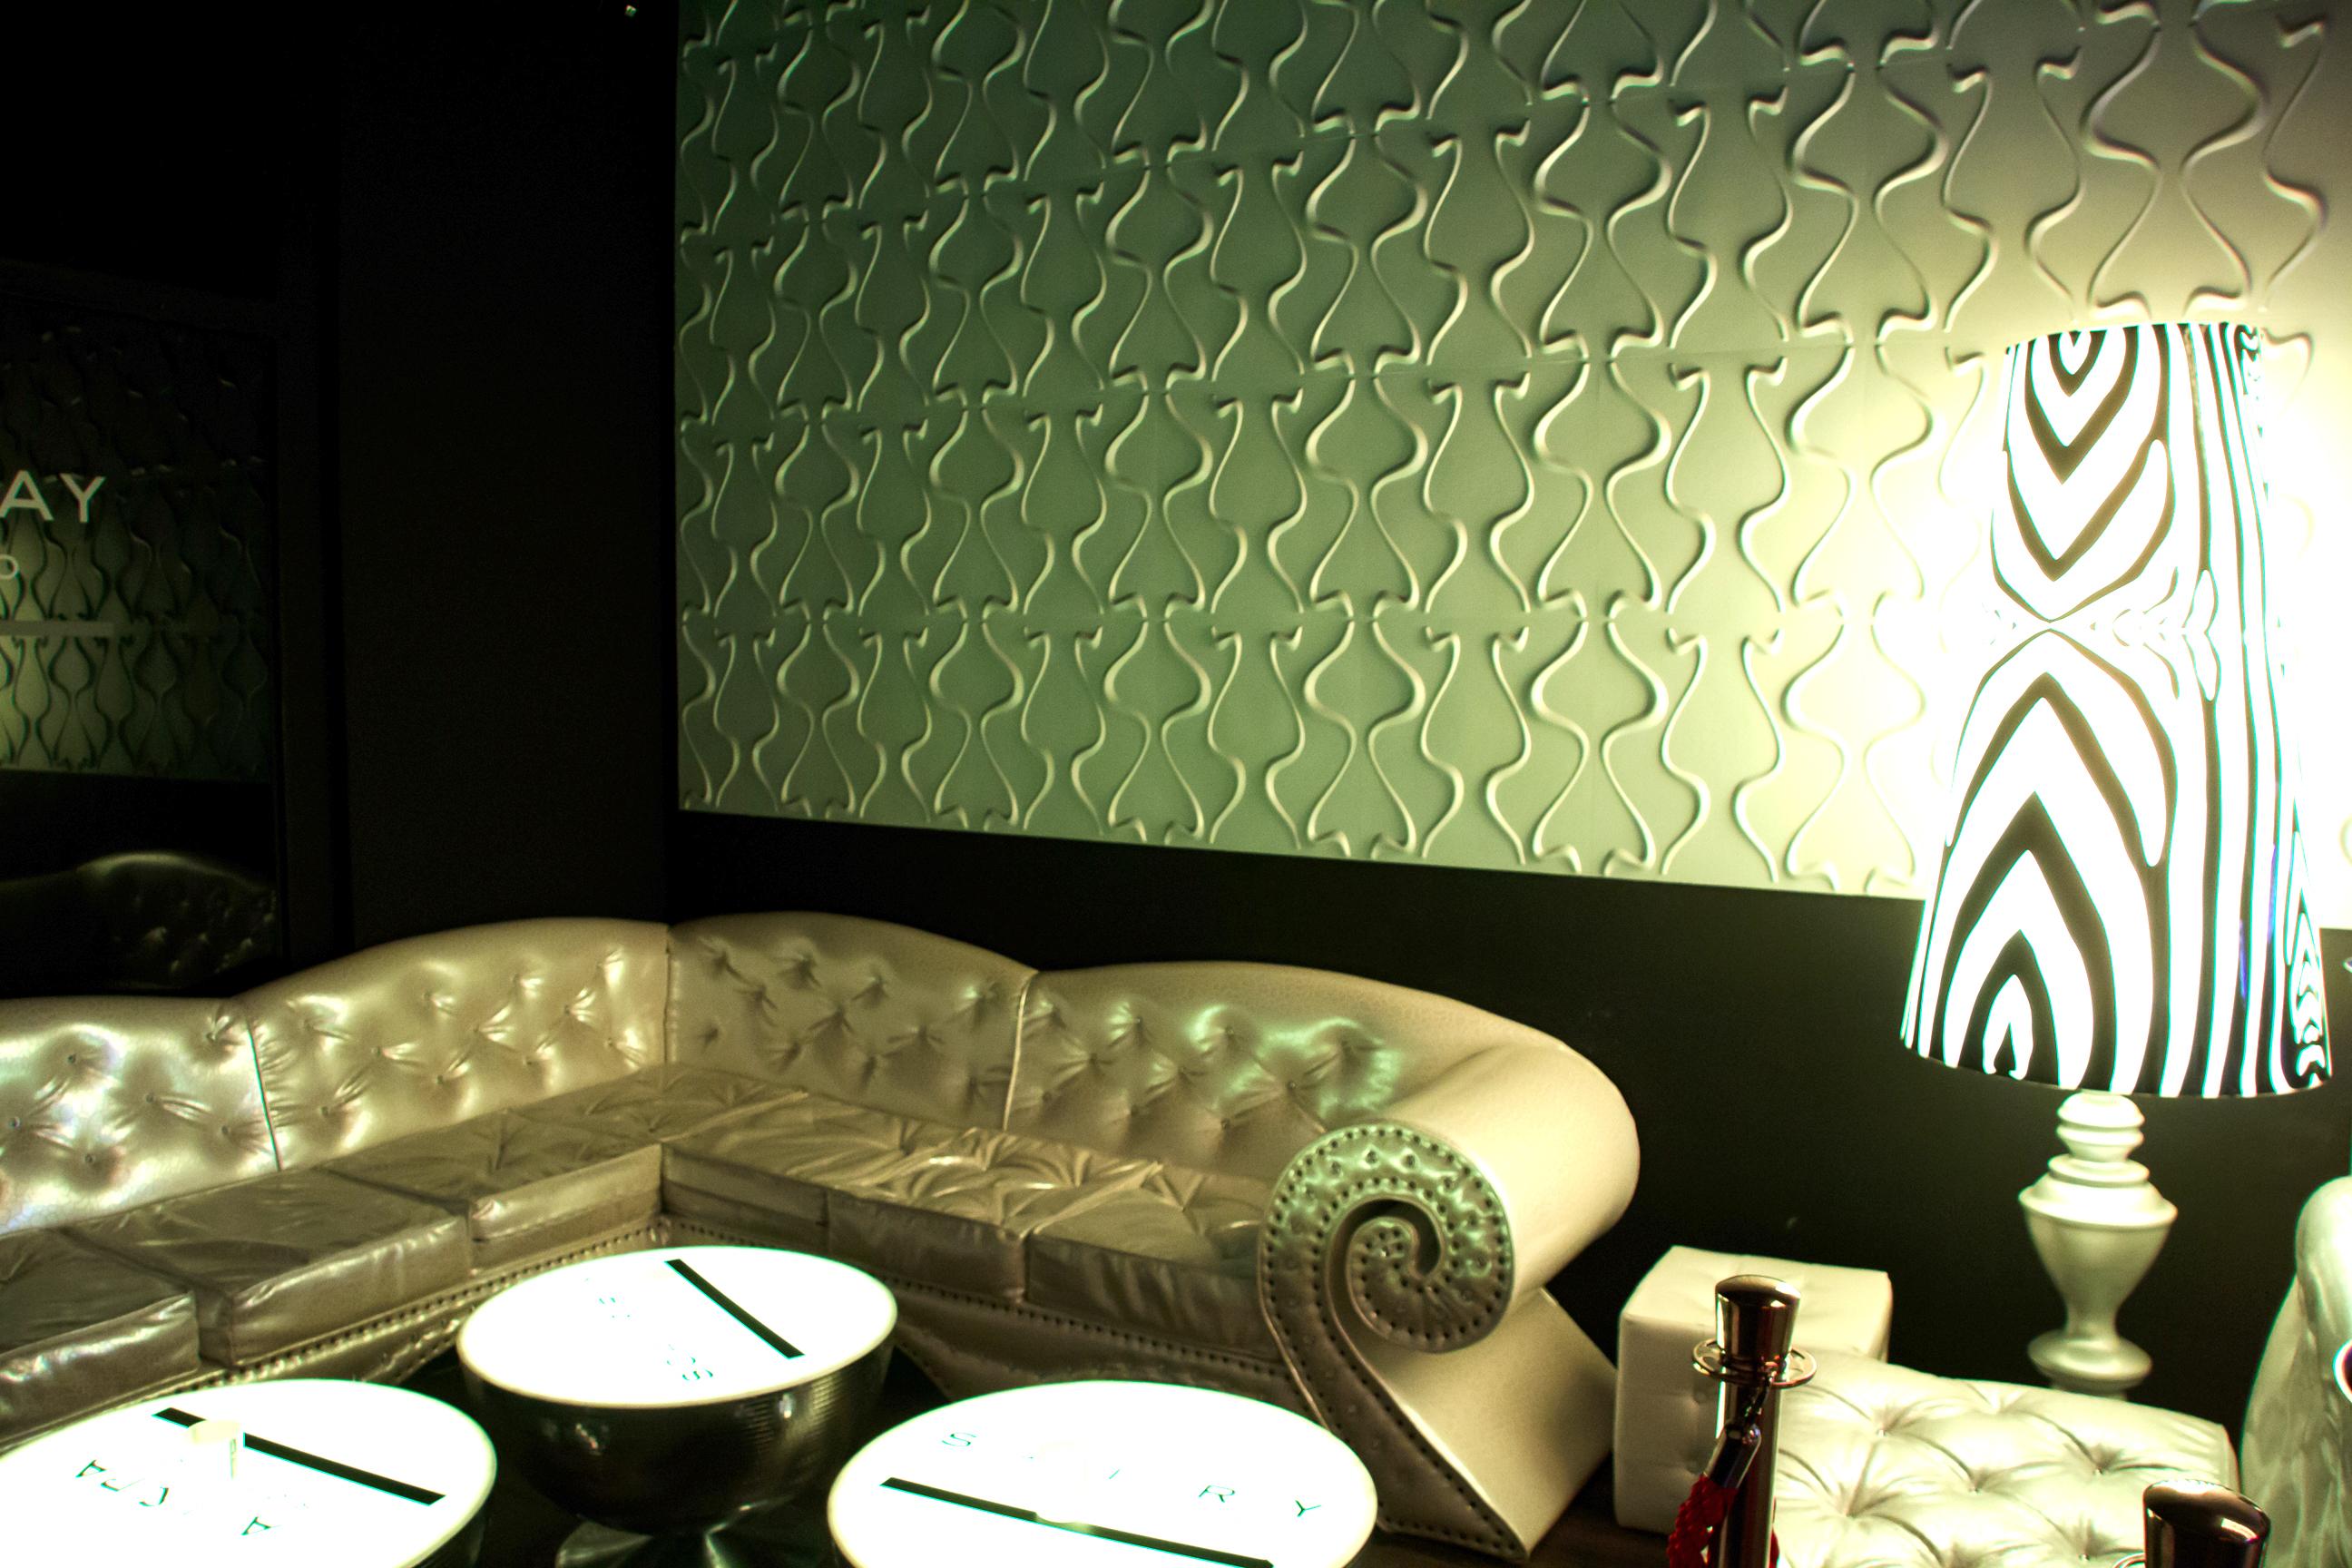 3D Wandpaneele - Referenzen - Phoenix Club - Malm - Deckenpaneele - 3D Tapeten - Wandverkleidung - Verblender